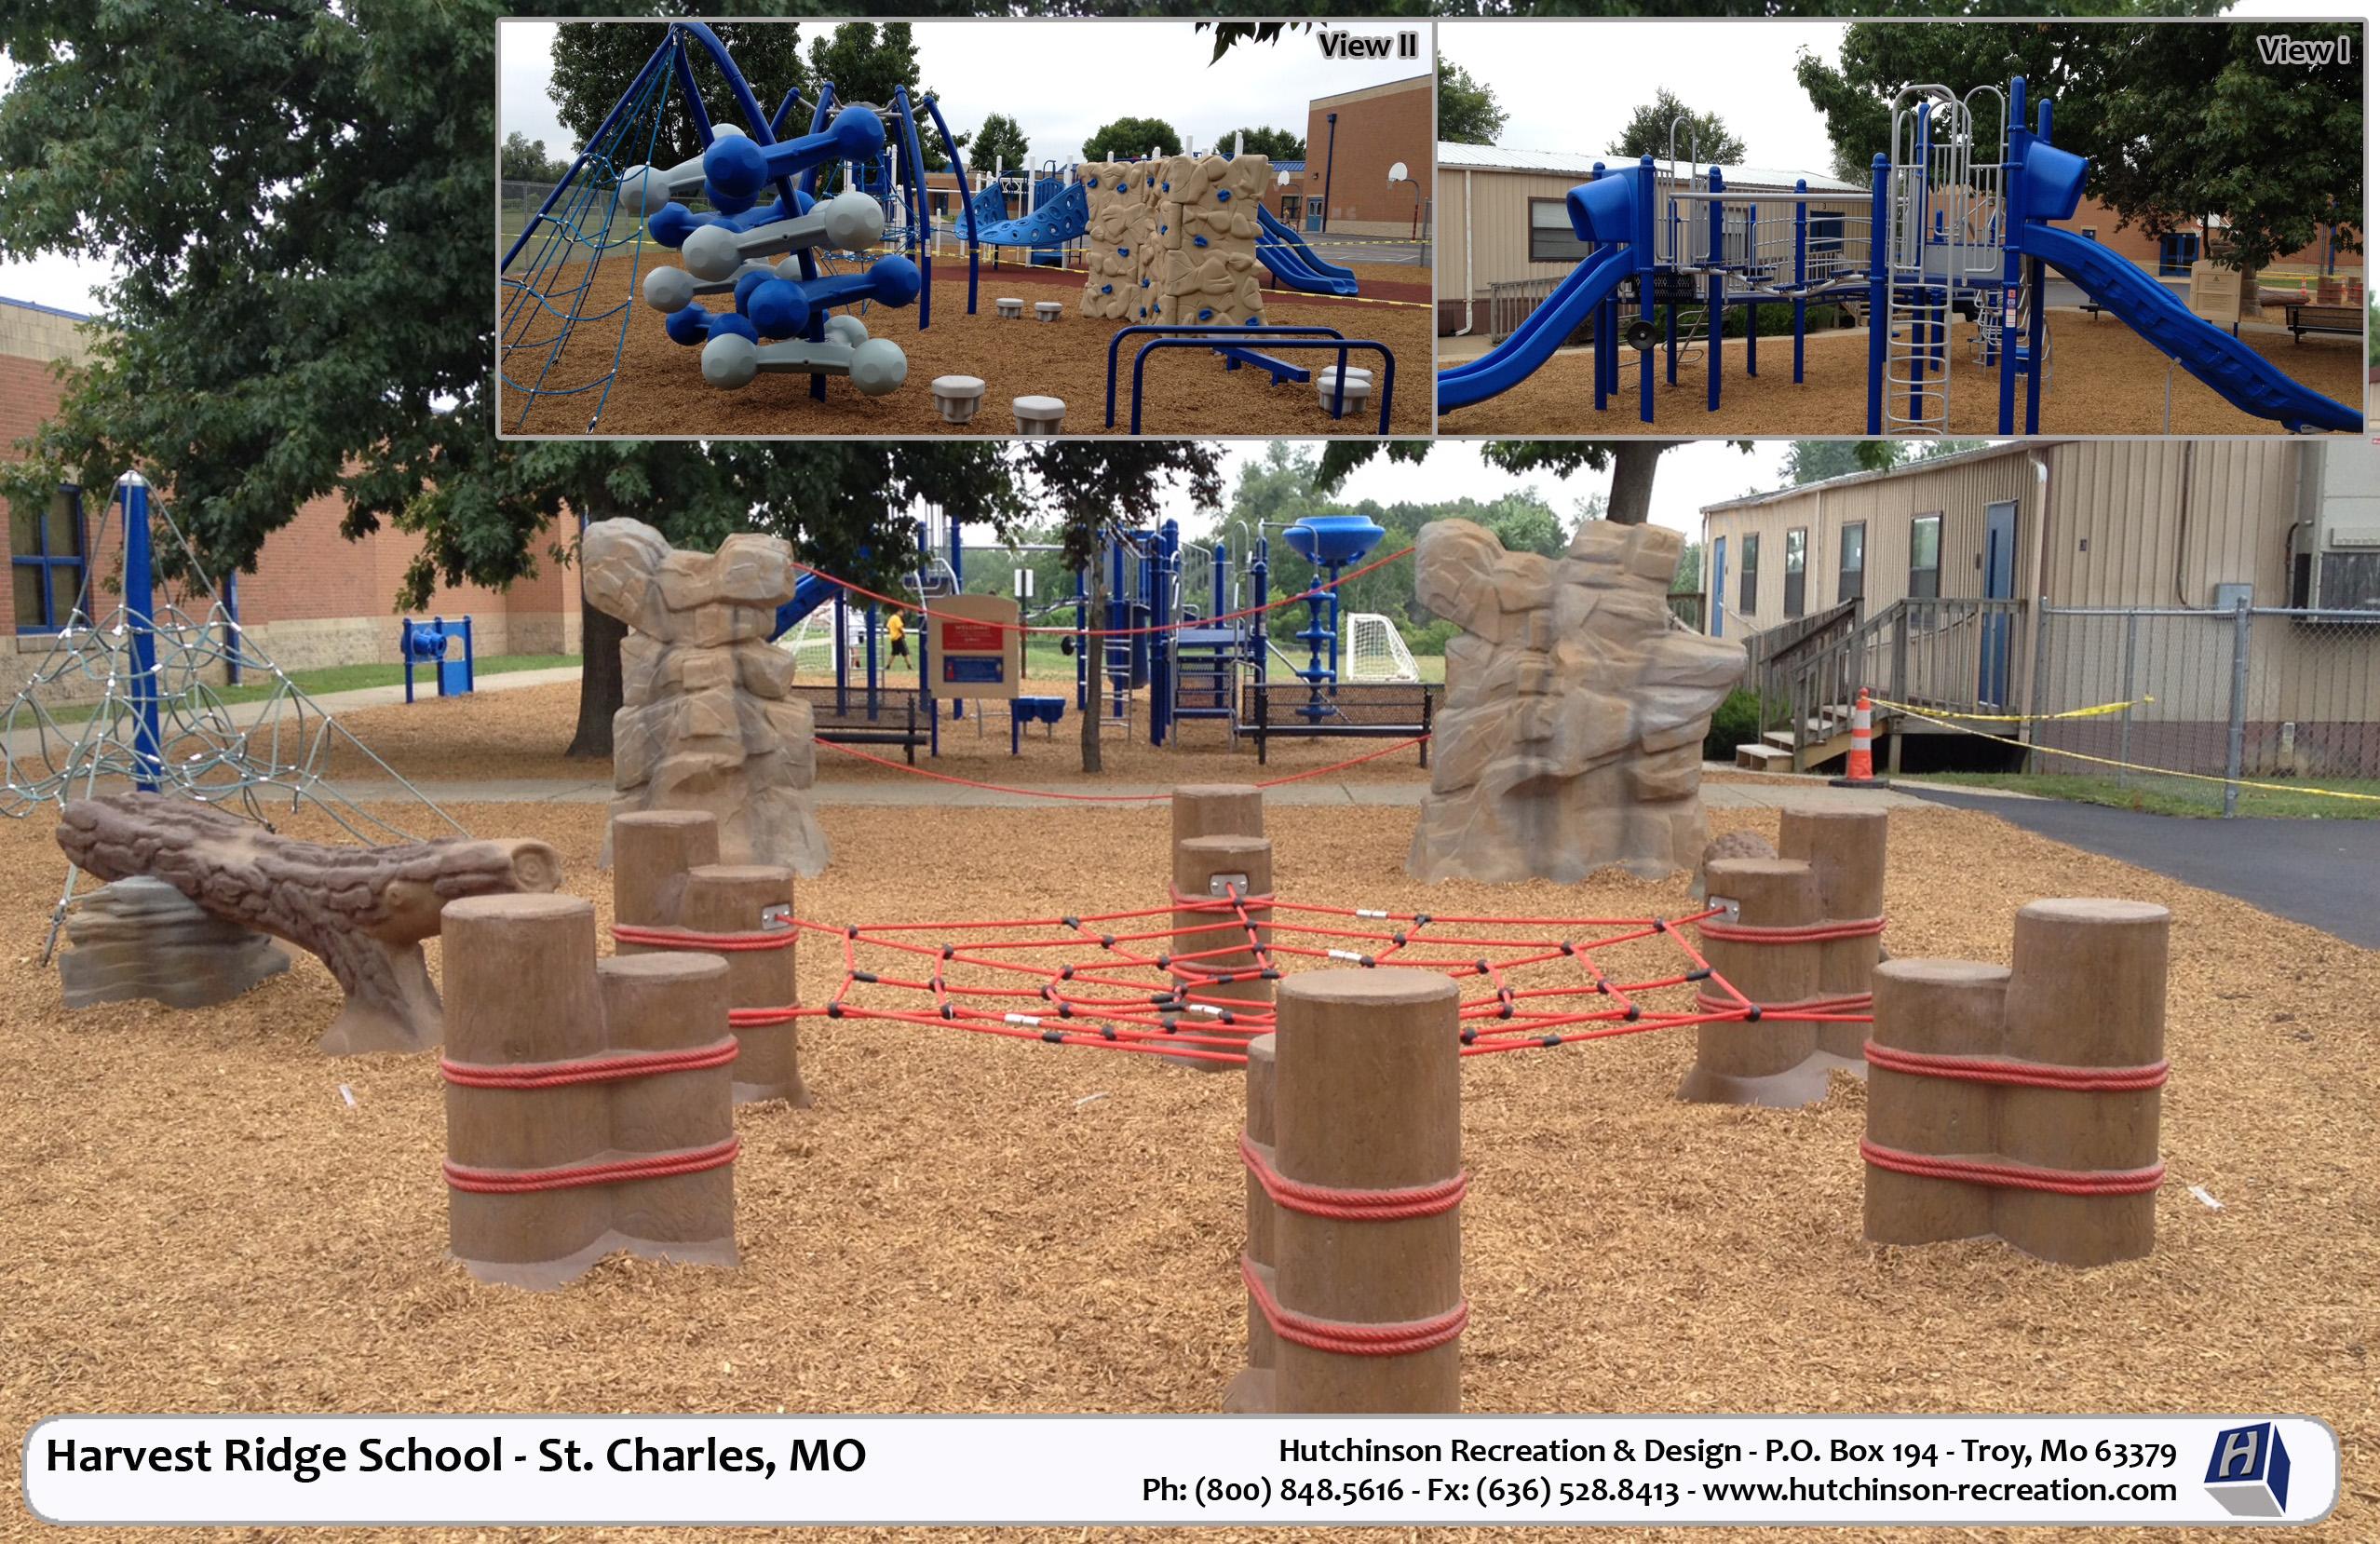 Harvest Ridge School - St. Charles-MO